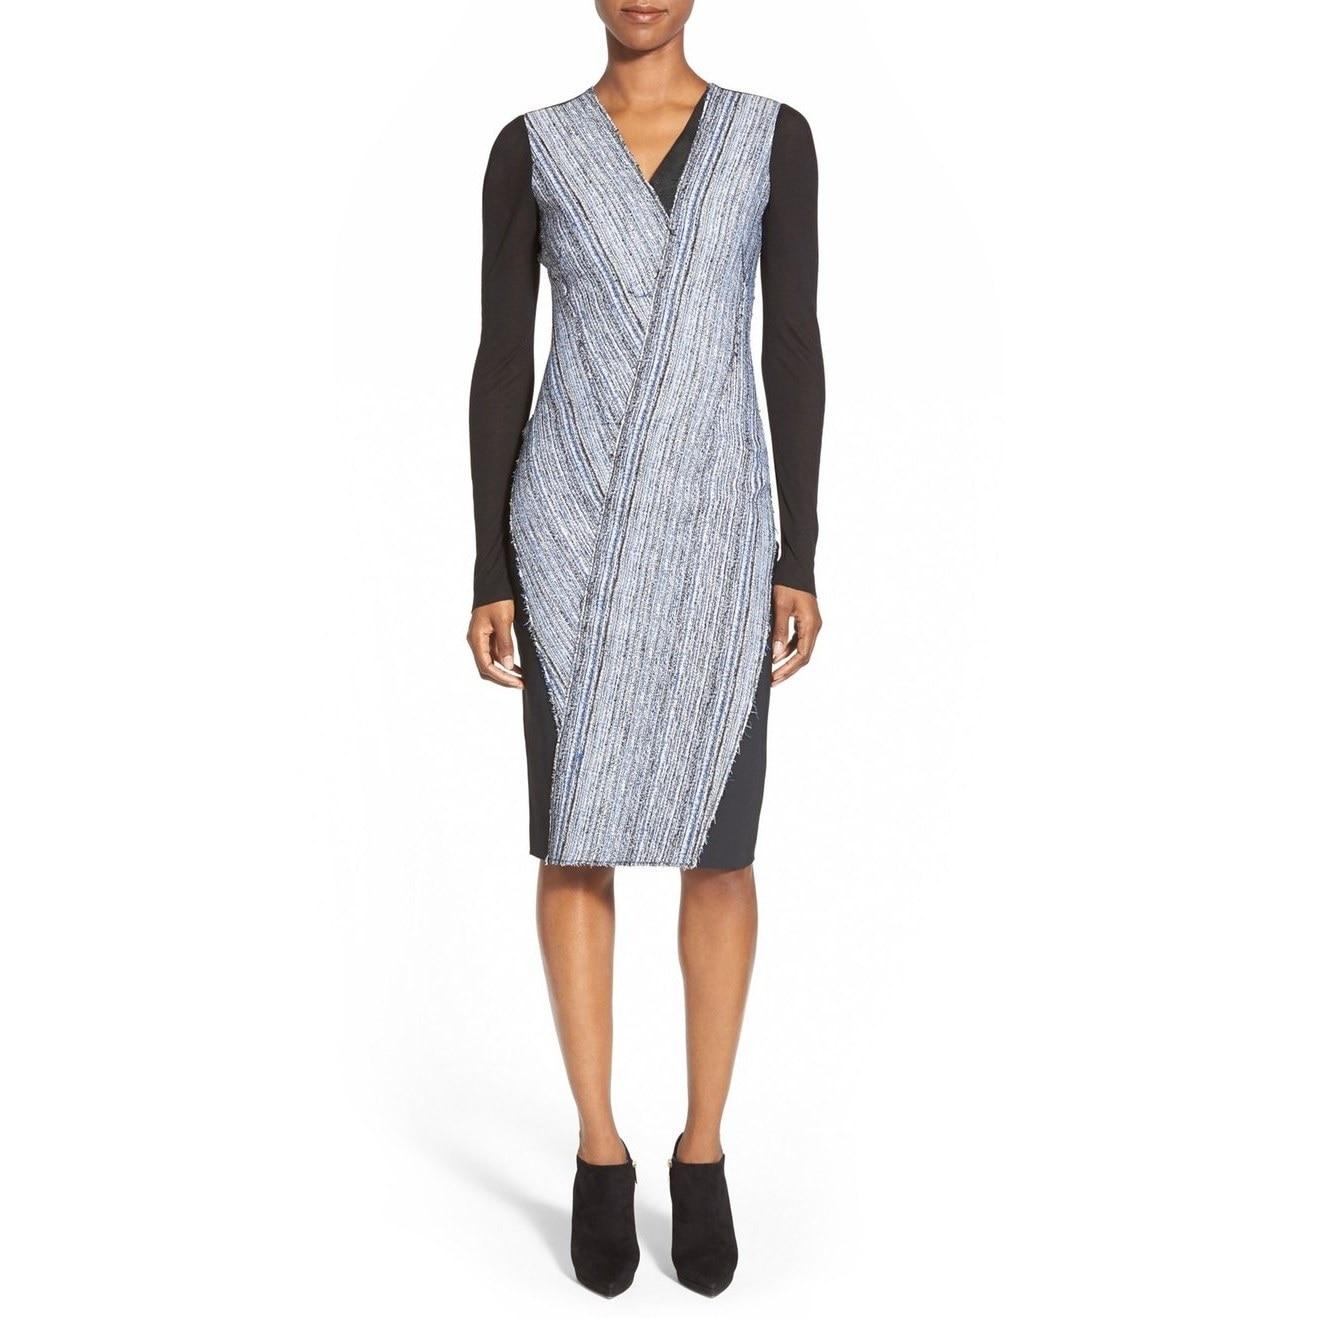 ac621df59a6b Shop Elie Tahari Cara Women's Blue Mixed Media Dress - Free Shipping Today  - Overstock - 13445588